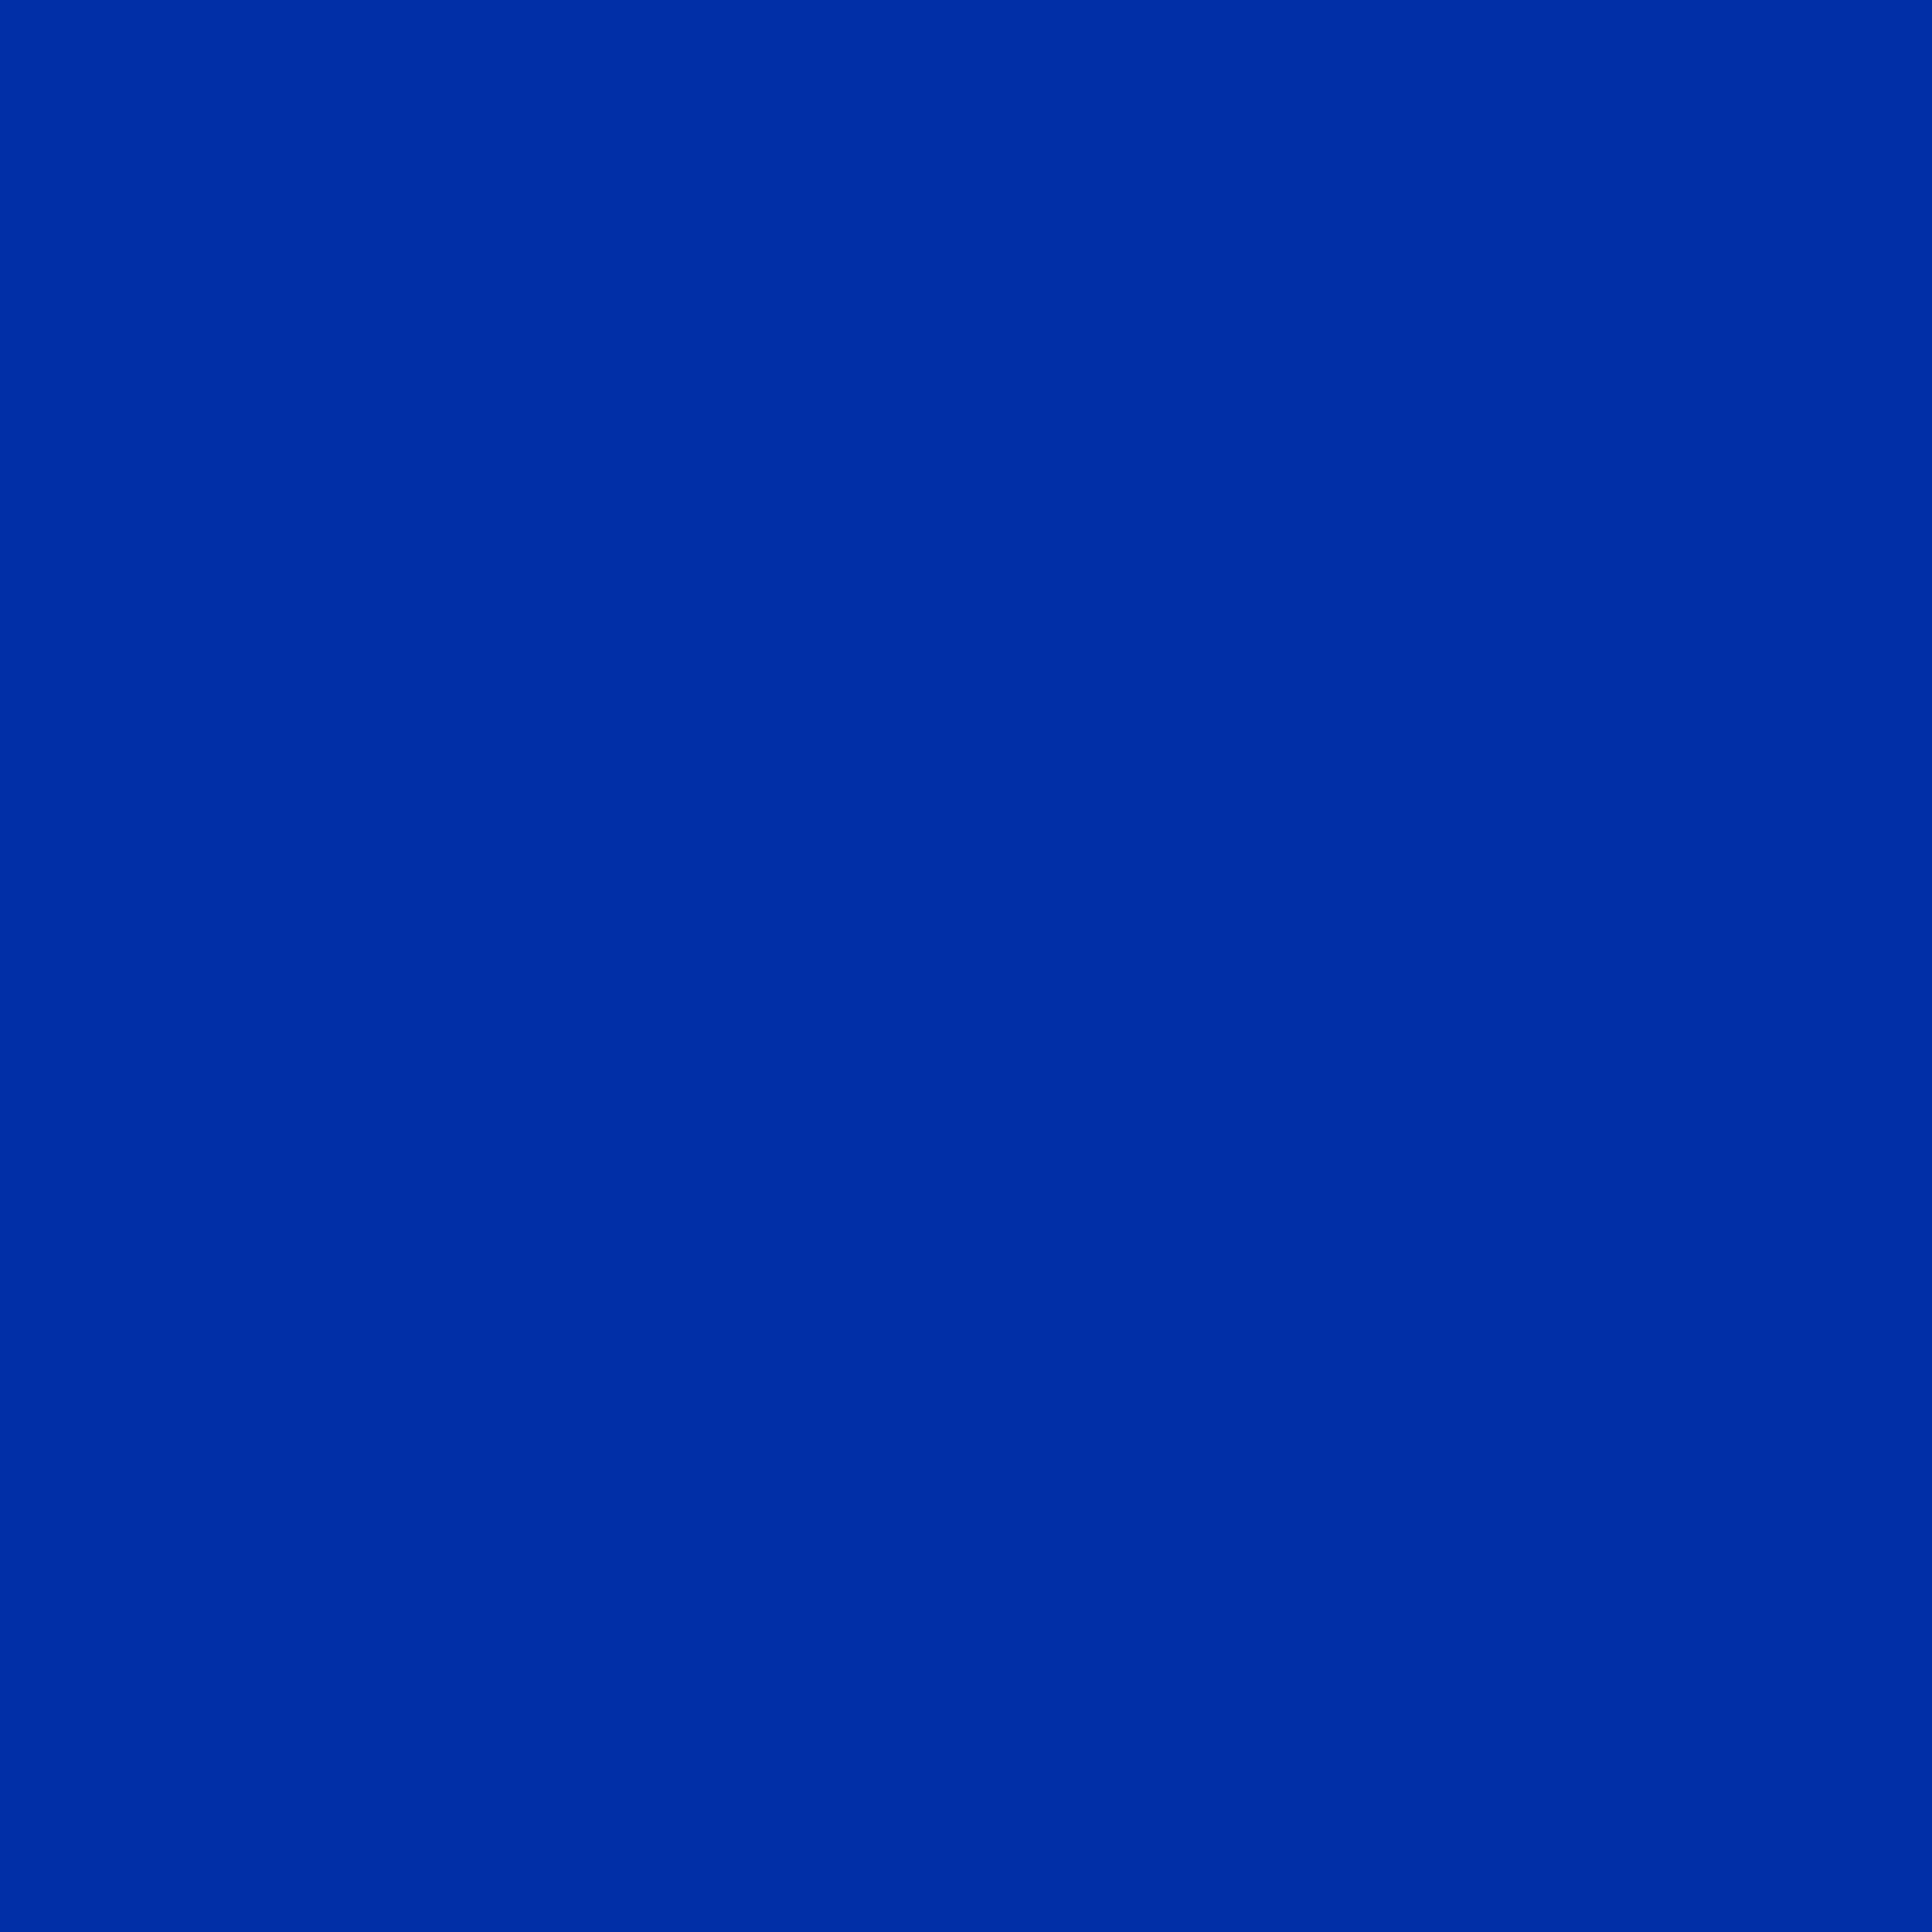 2048x2048 International Klein Blue Solid Color Background